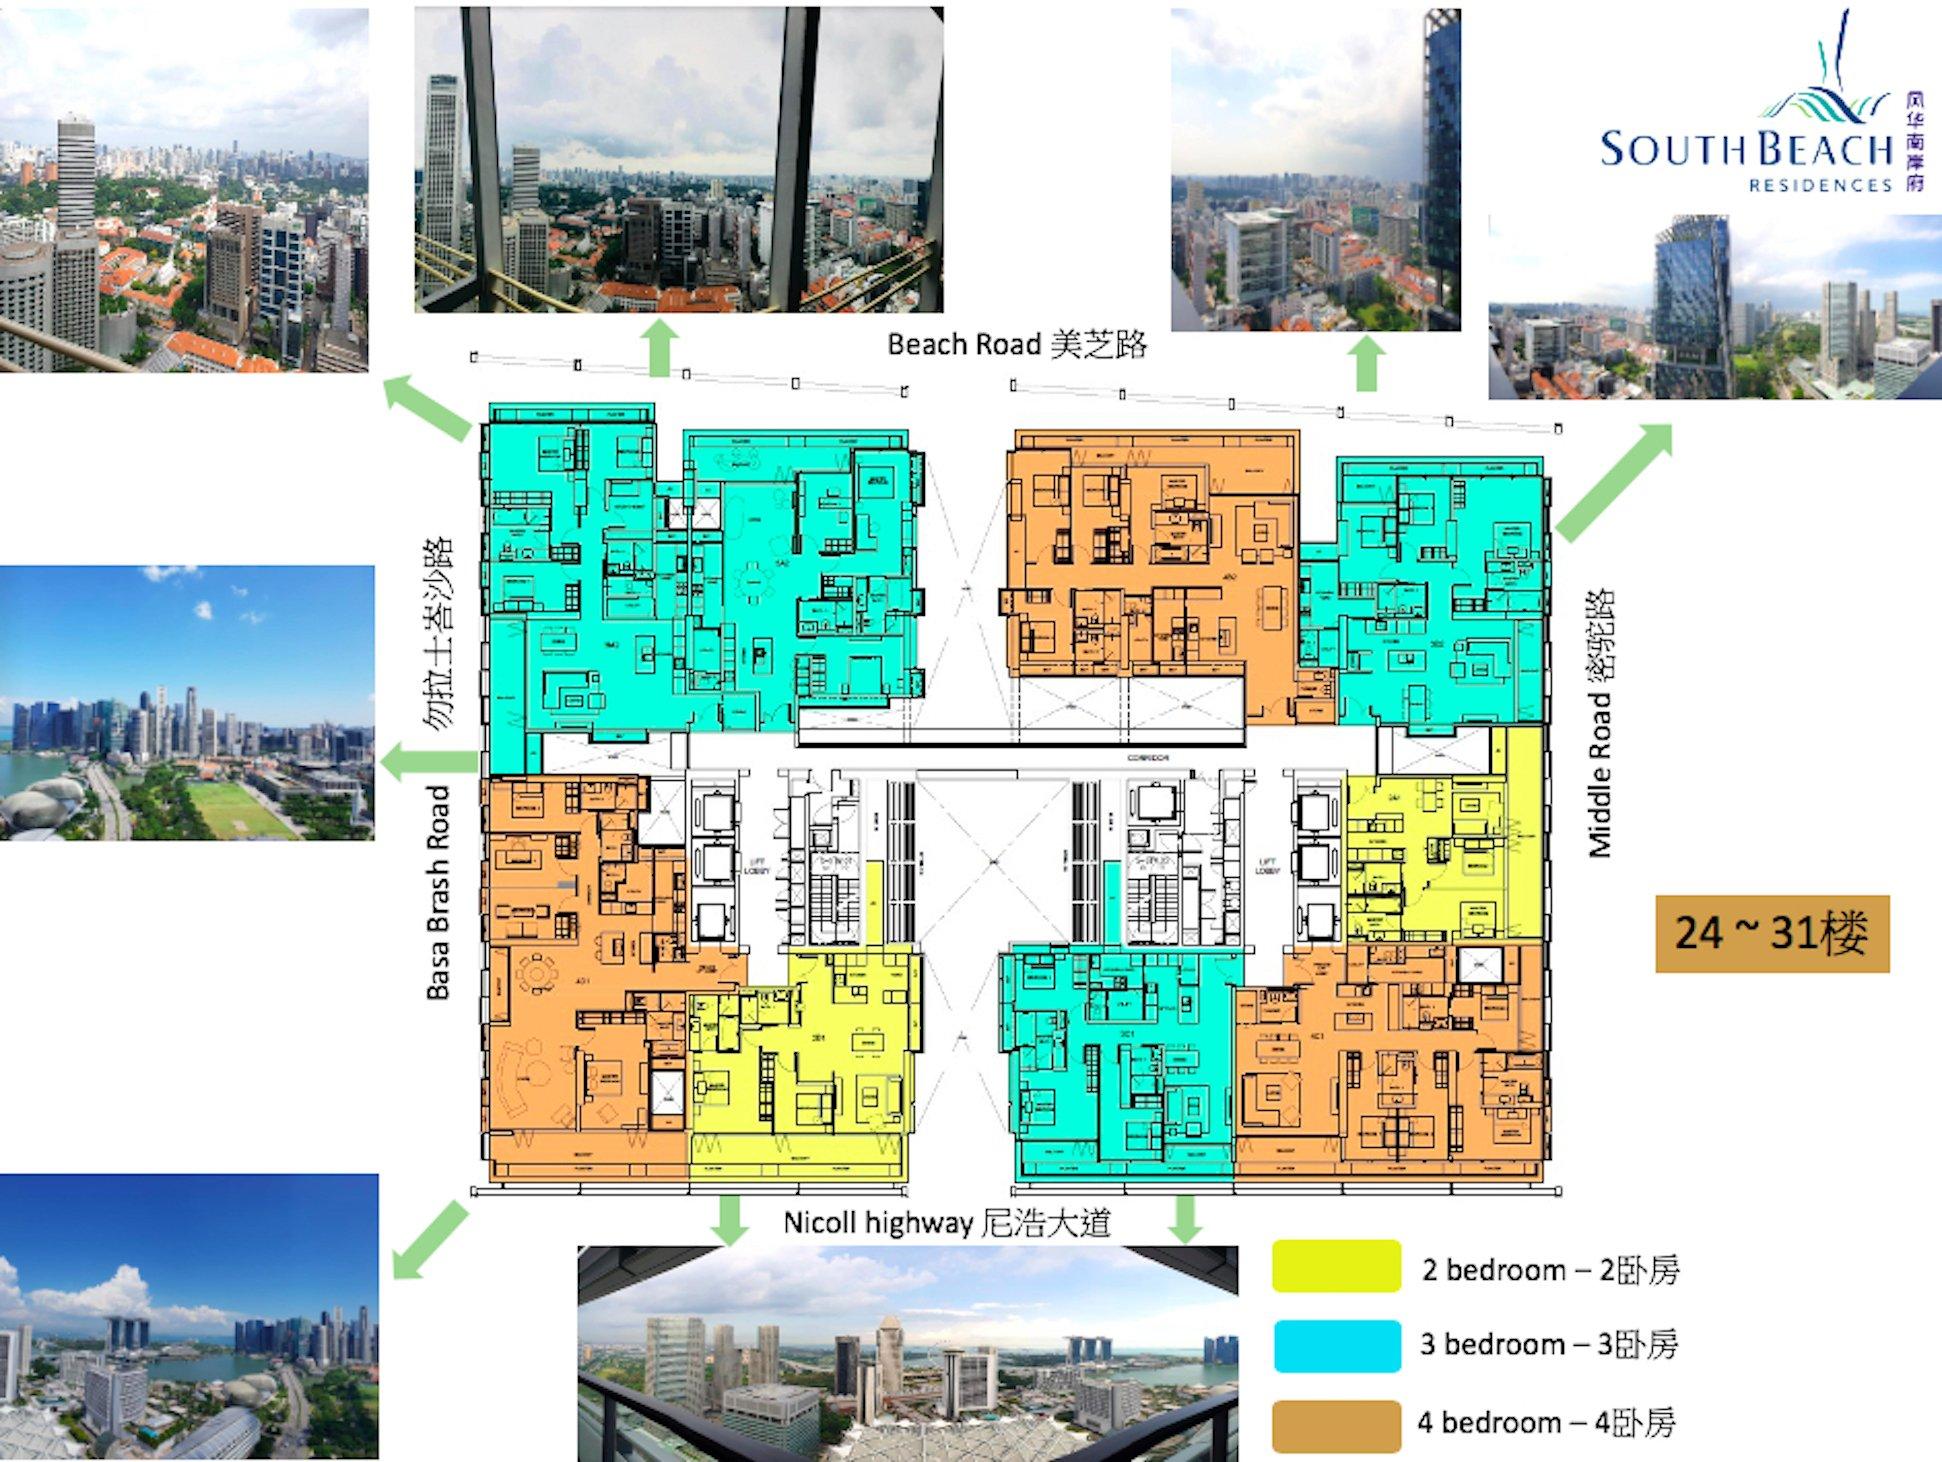 South Beach Residences-风华南岸府24-31楼户型方向区位图